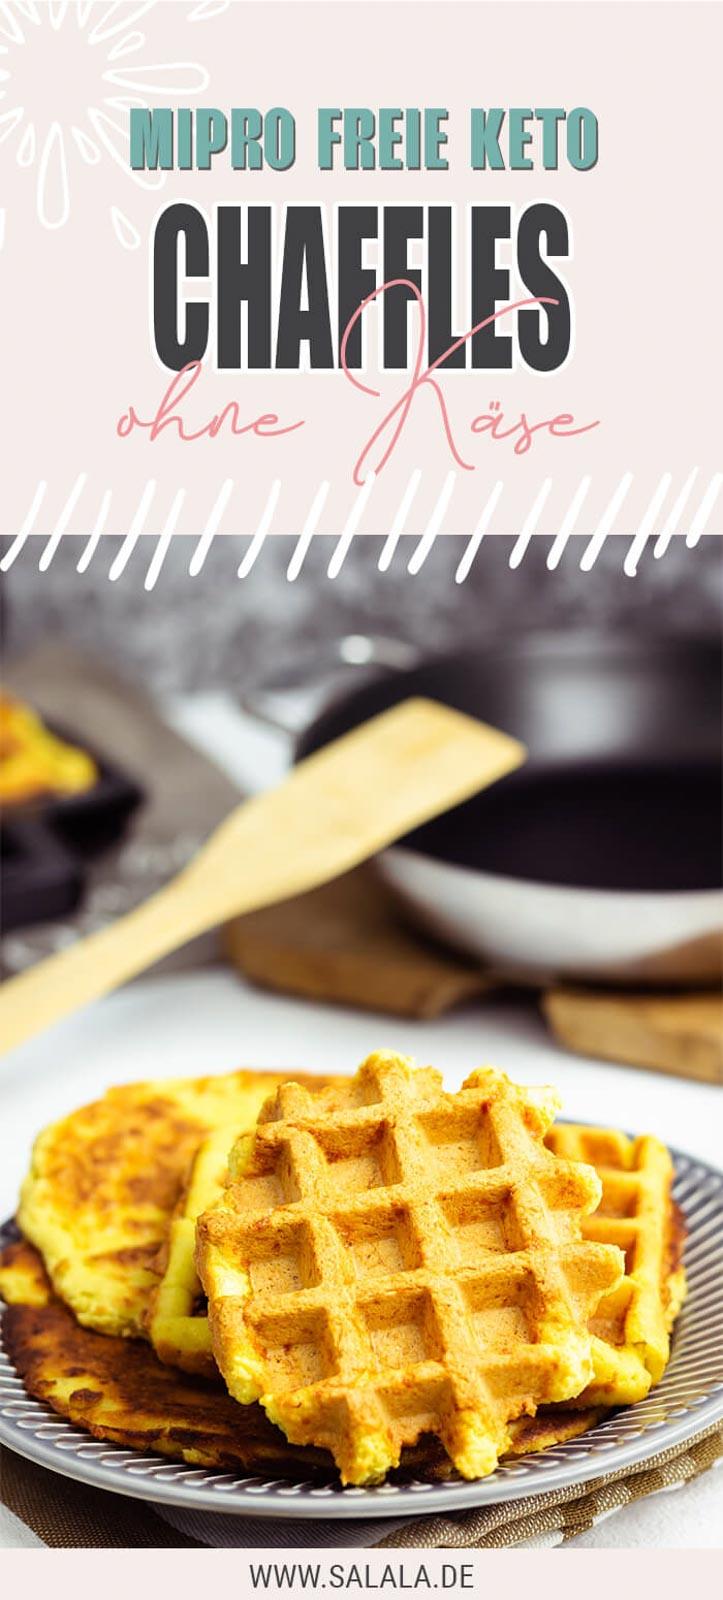 Chaffles OHNE Käse - Keto Waffel Rezept ohne Milchprodukte